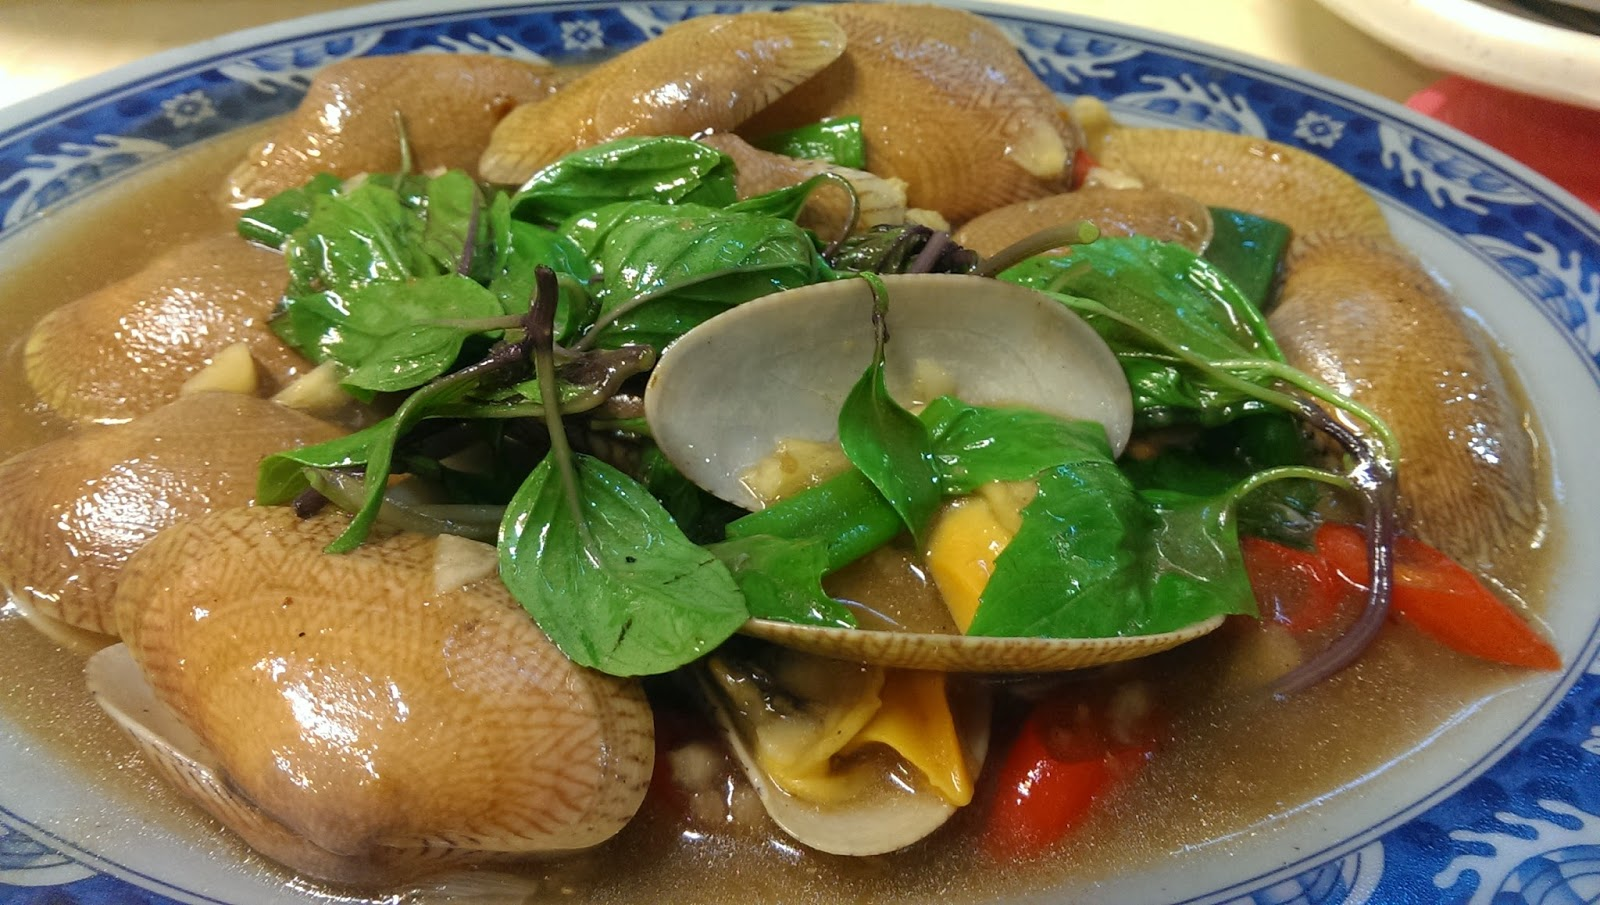 2015 02 02%2B12.44.29 - [食記] 葉家生魚片 - 布袋觀光漁市中的鮮魚餐廳